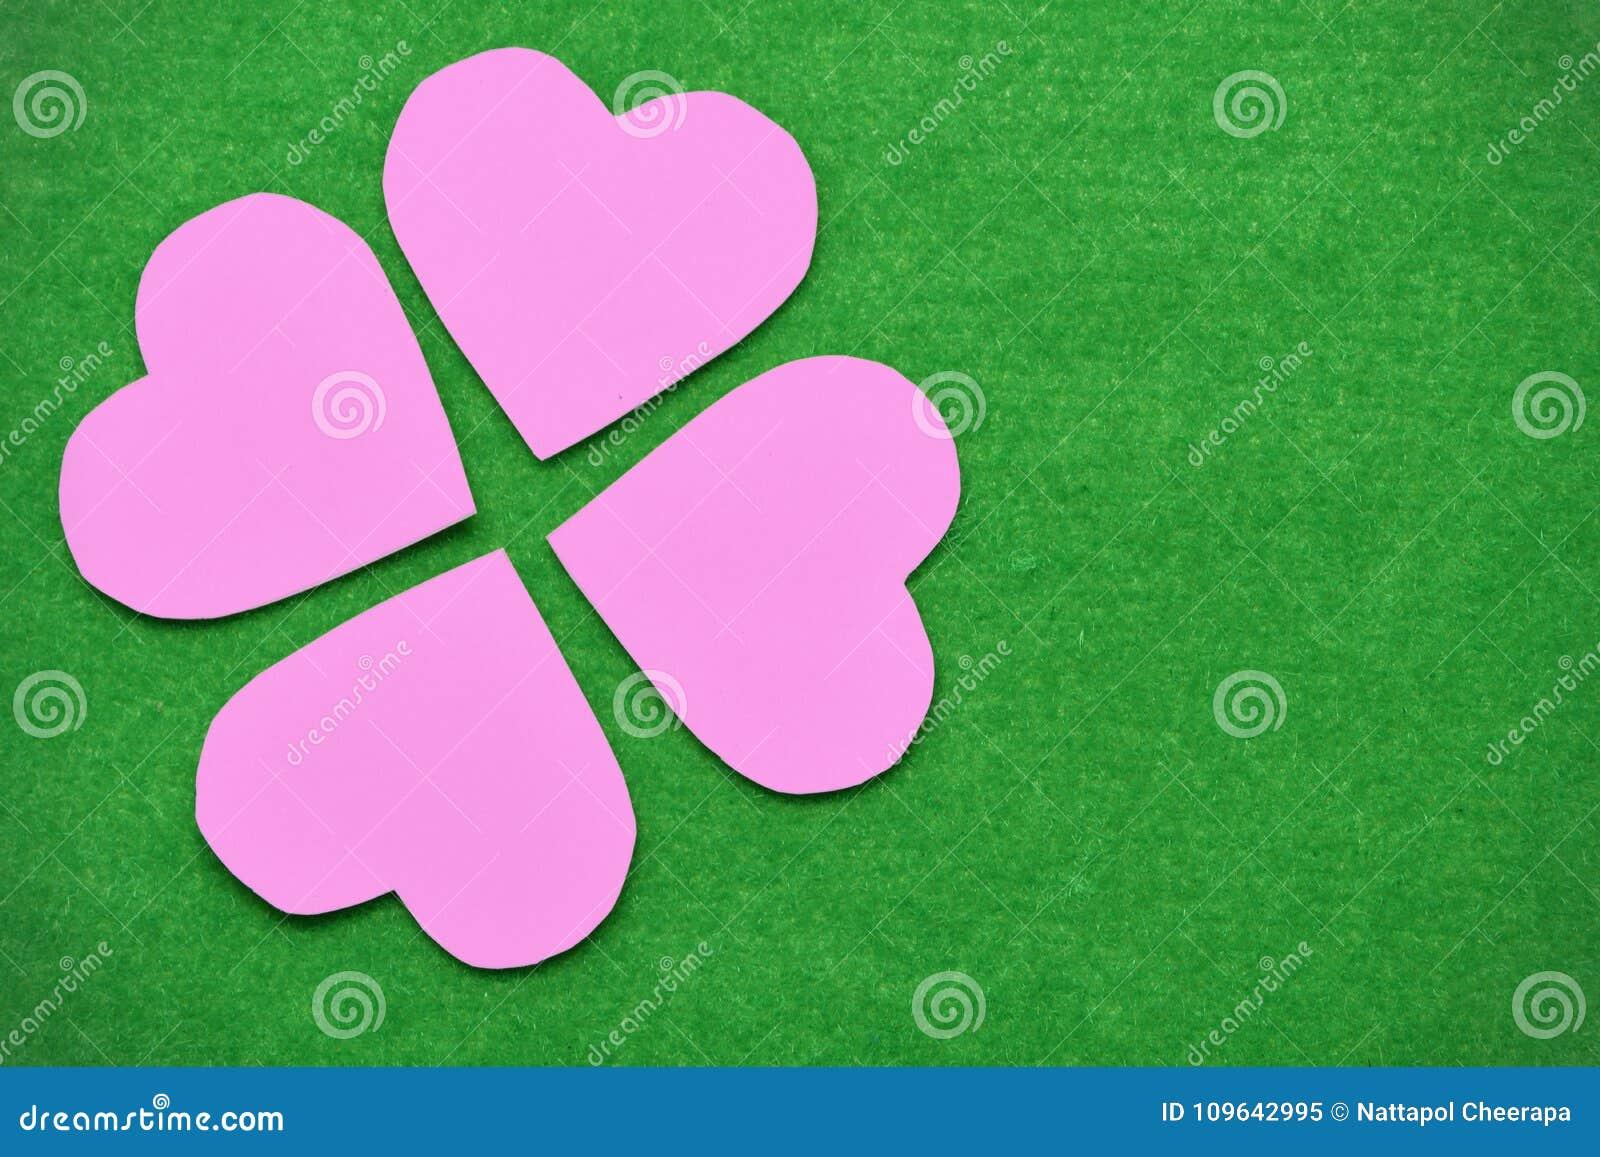 pink-hearts-arranged-like-flower-petals-placed-moist-green-spaces-109642995.jpg